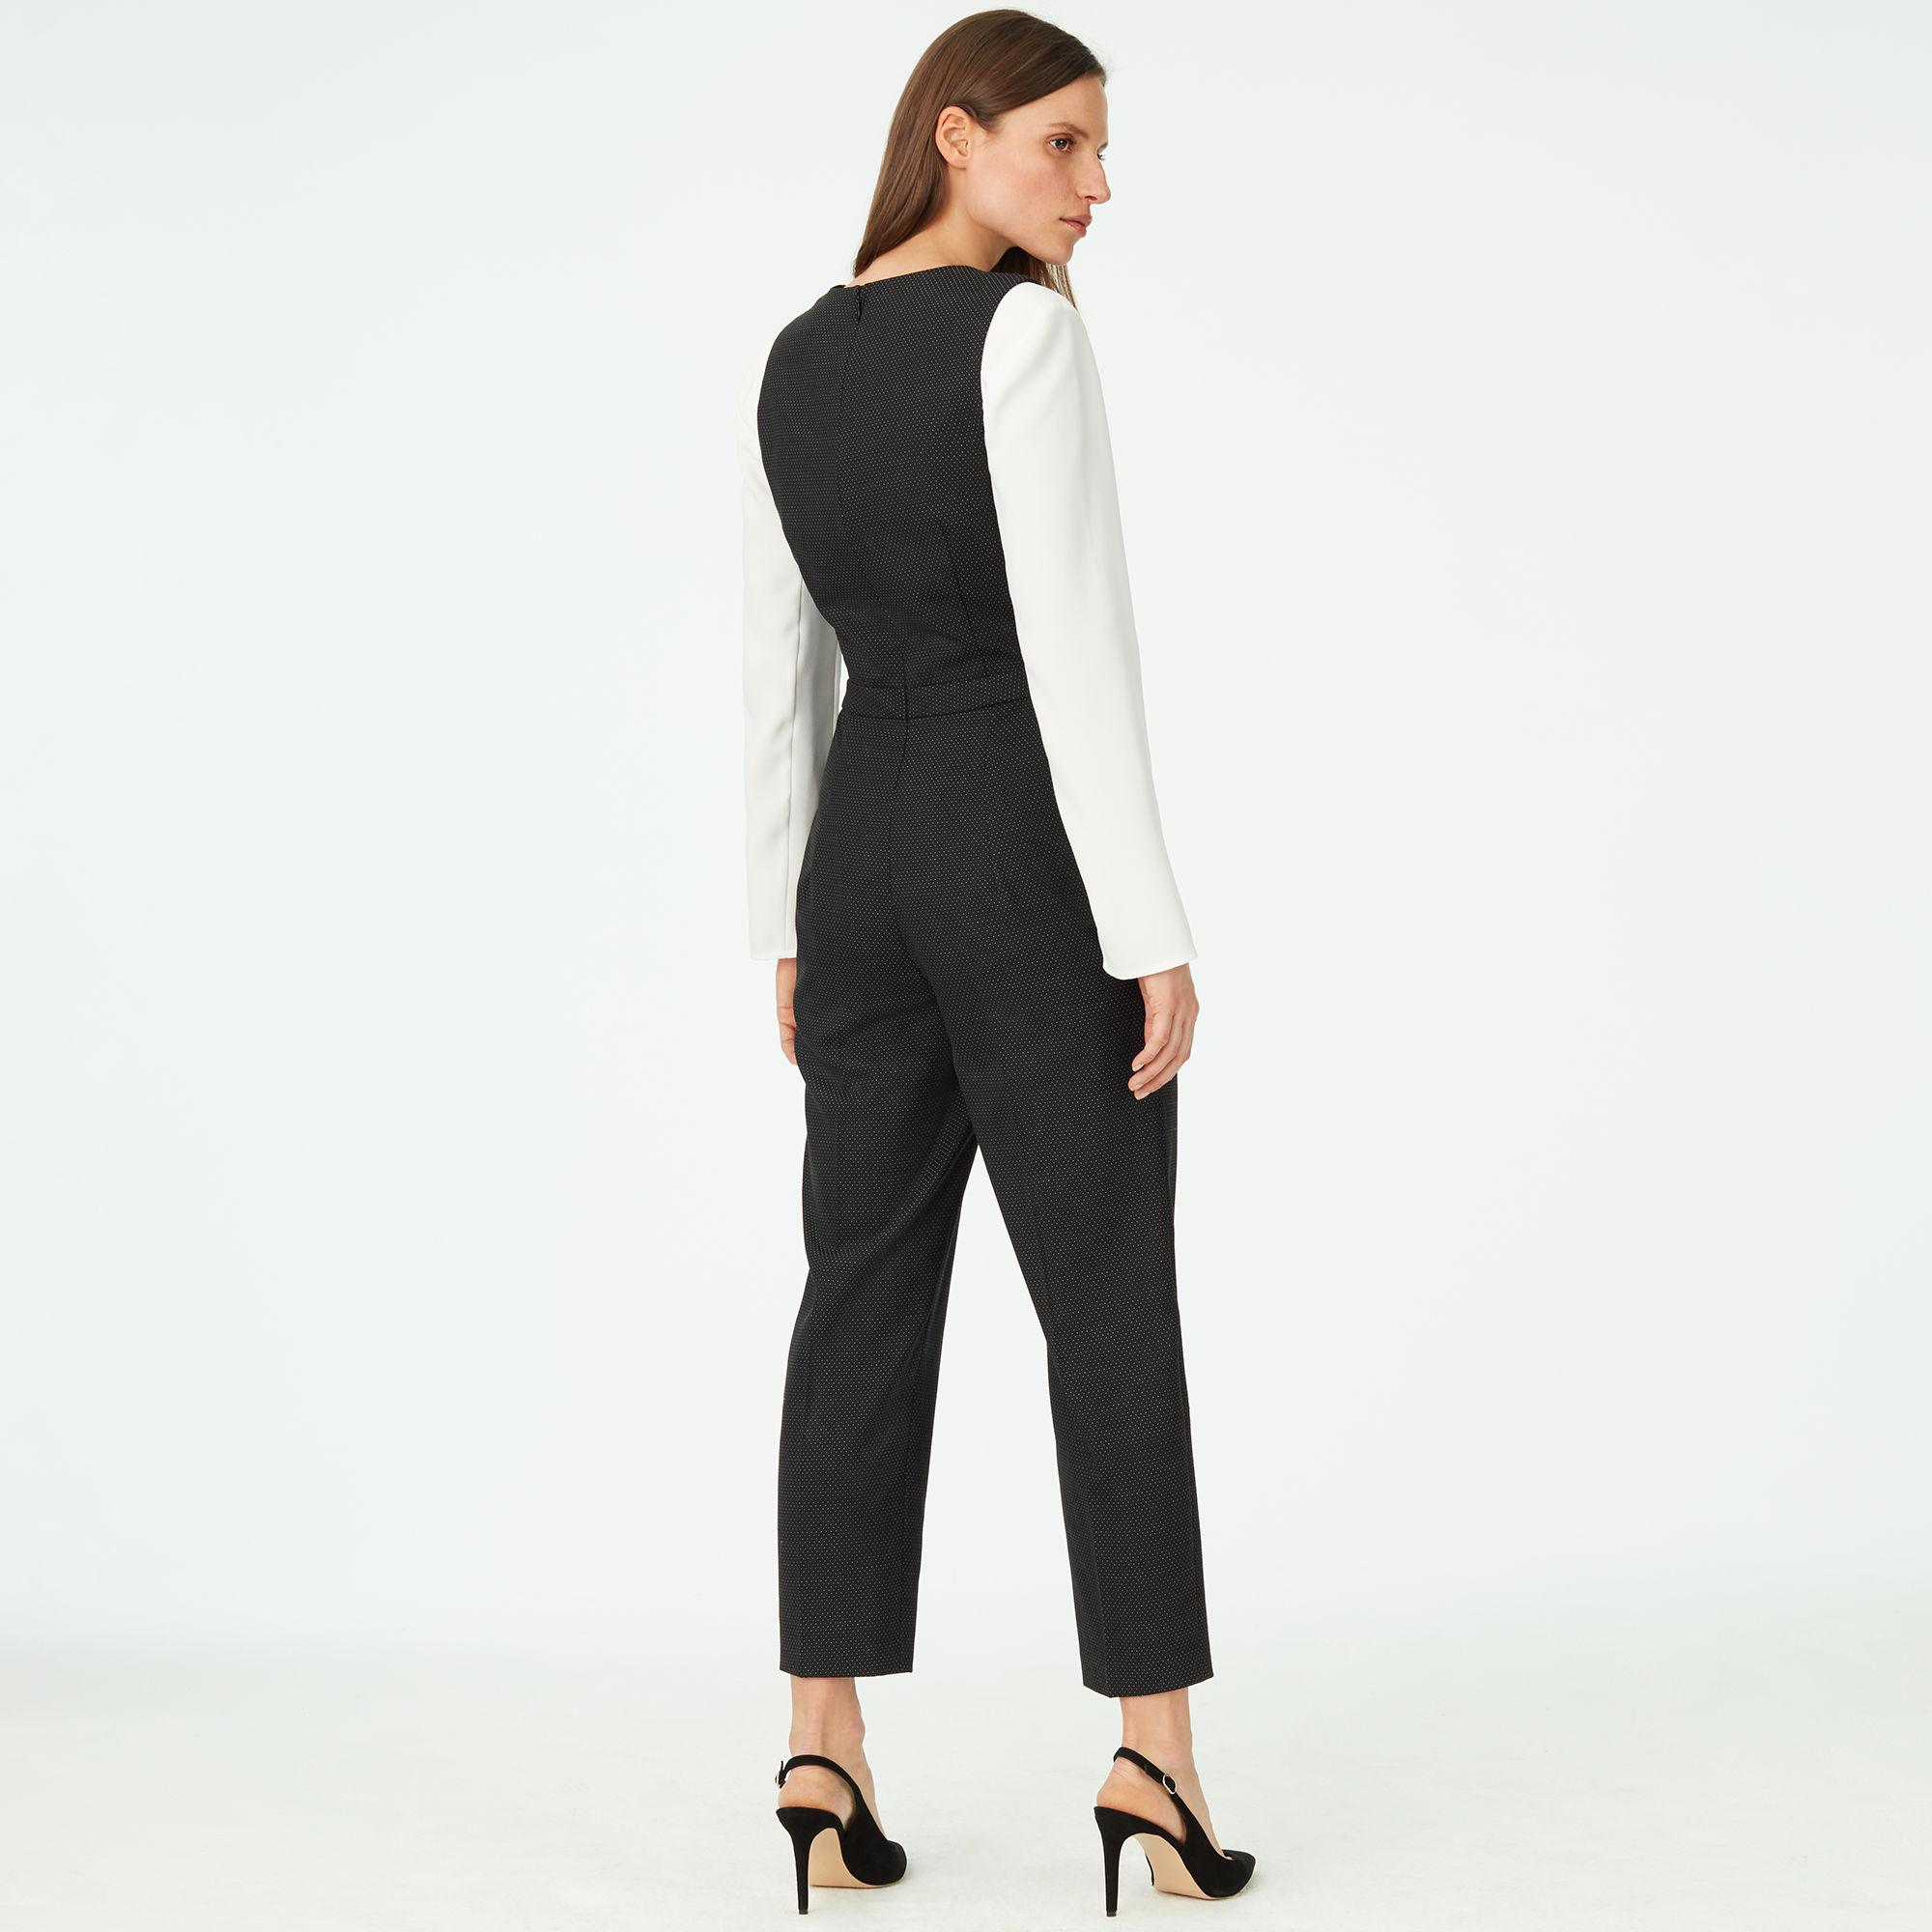 445d9b7d54bf Lyst - Club Monaco Dorotheah Pin-dot Jumpsuit in Black